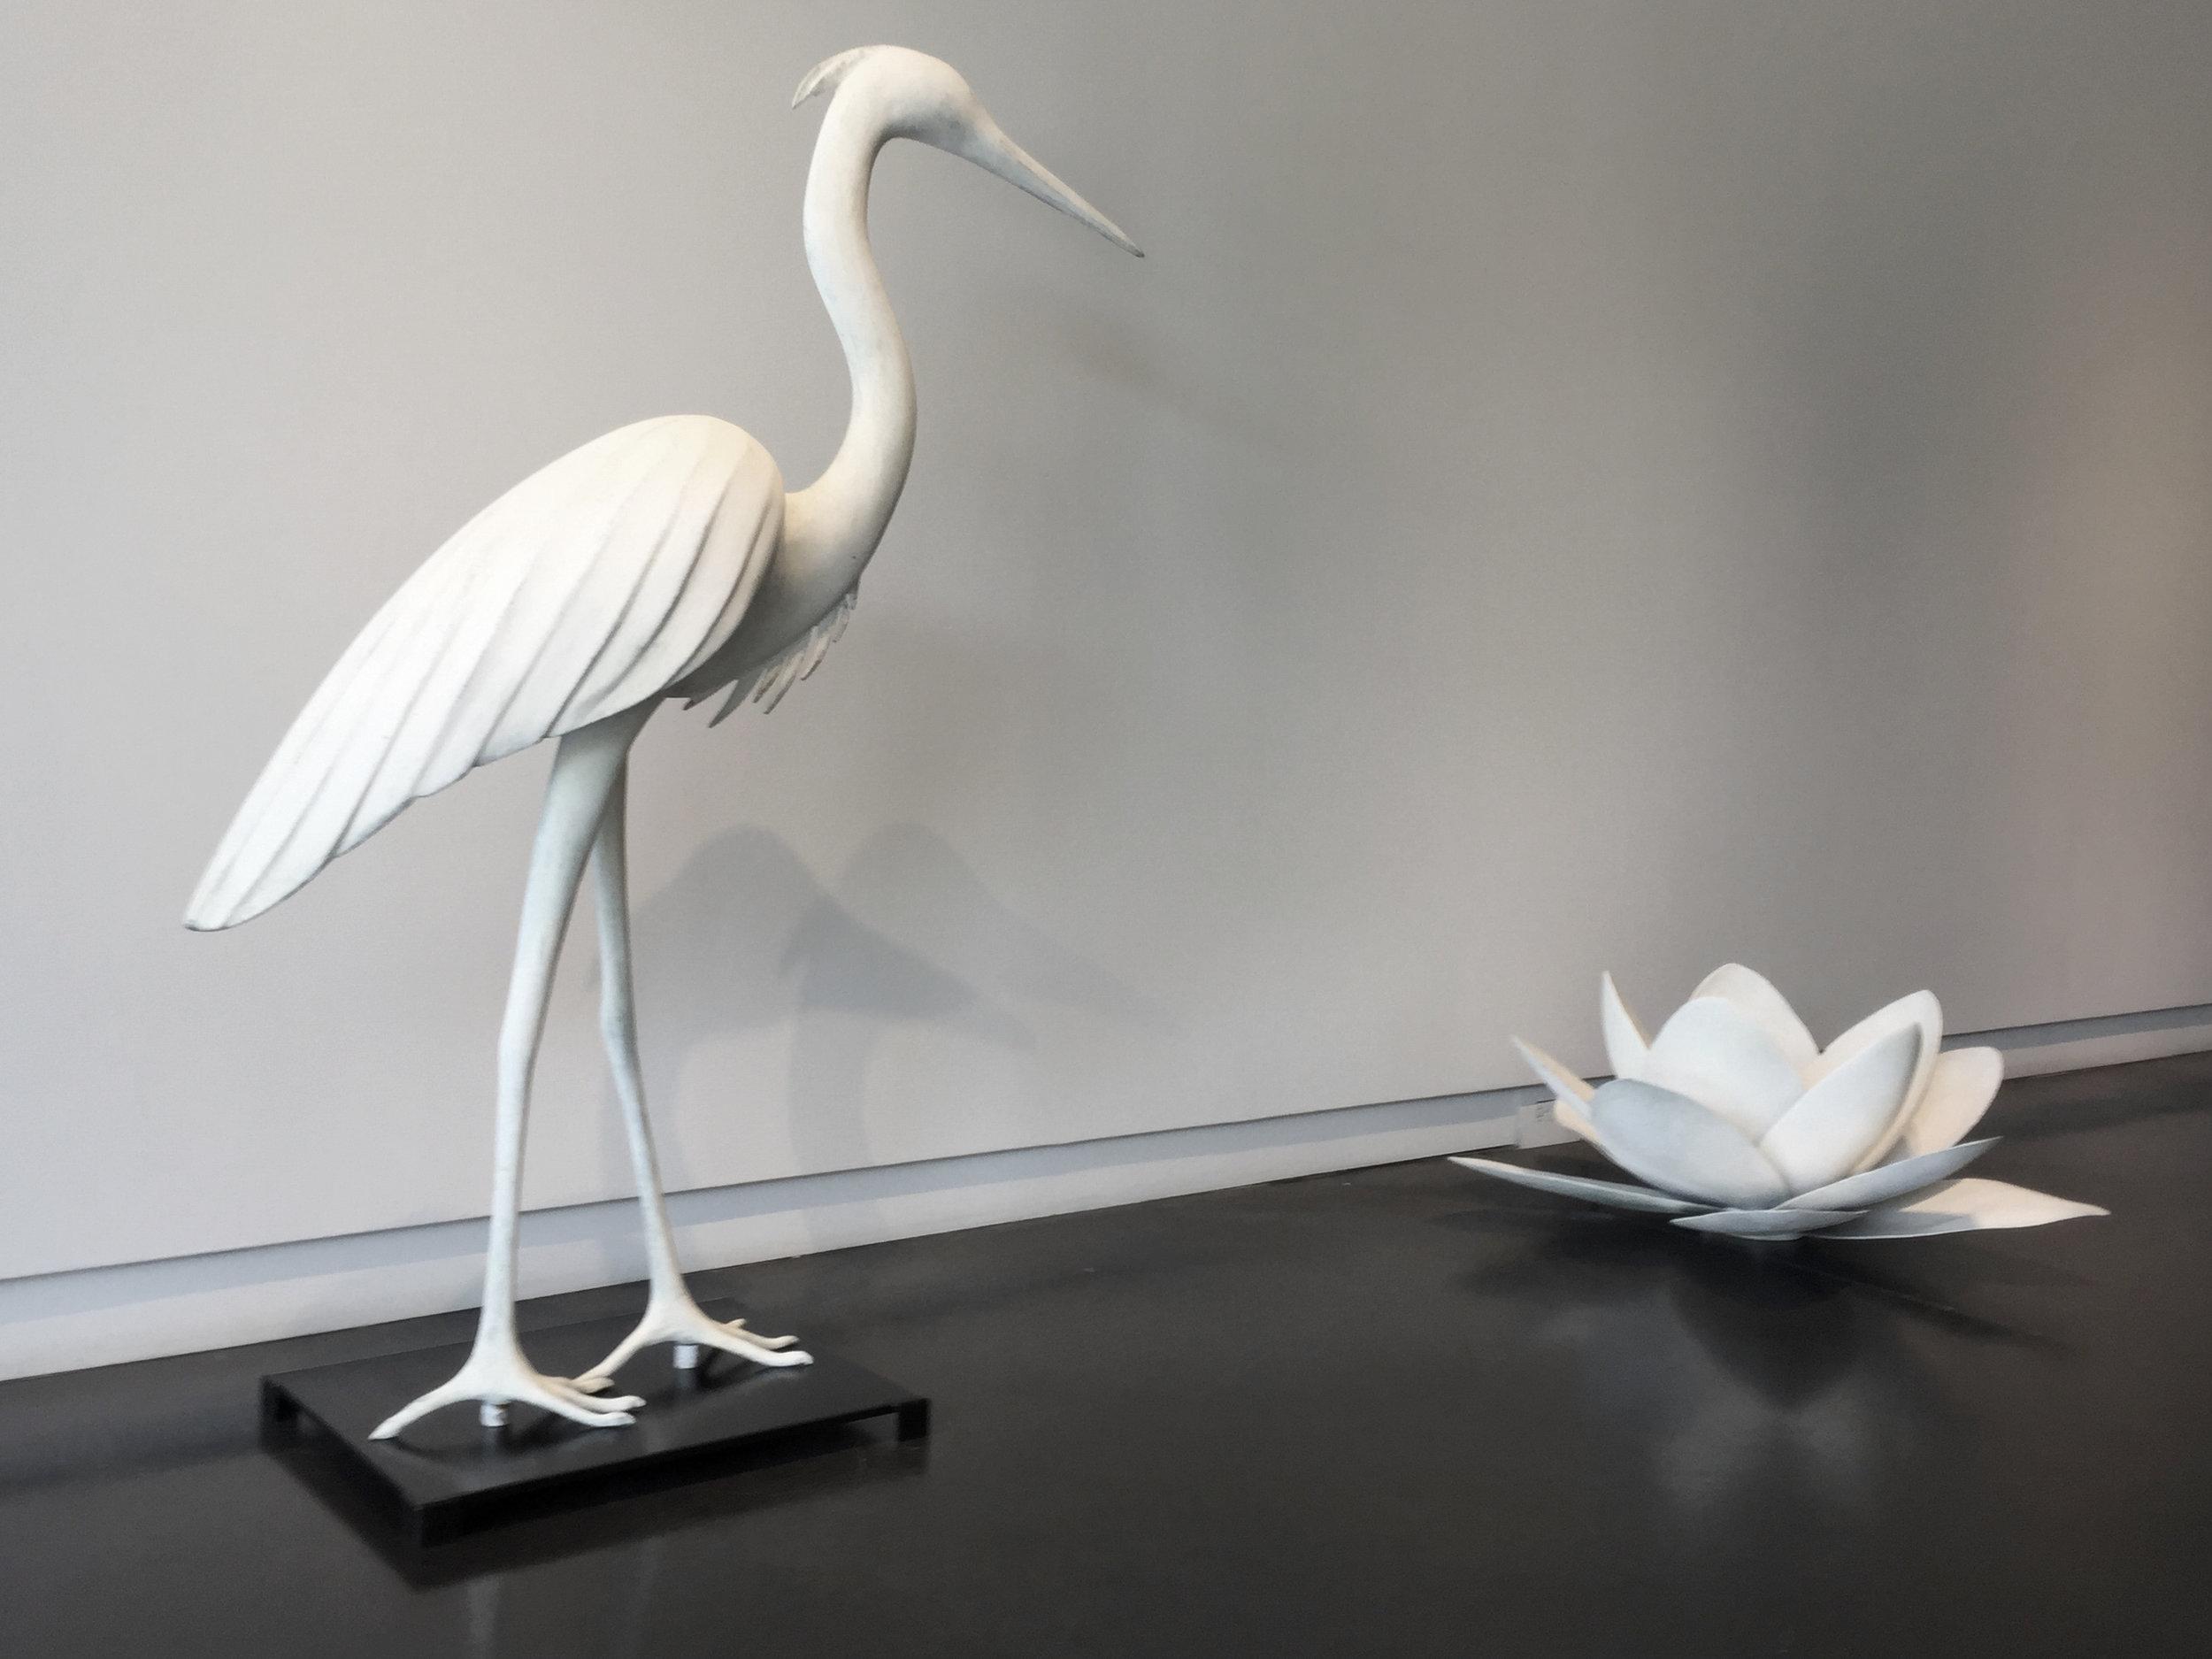 Lotus Flower 3 and Medium Heron